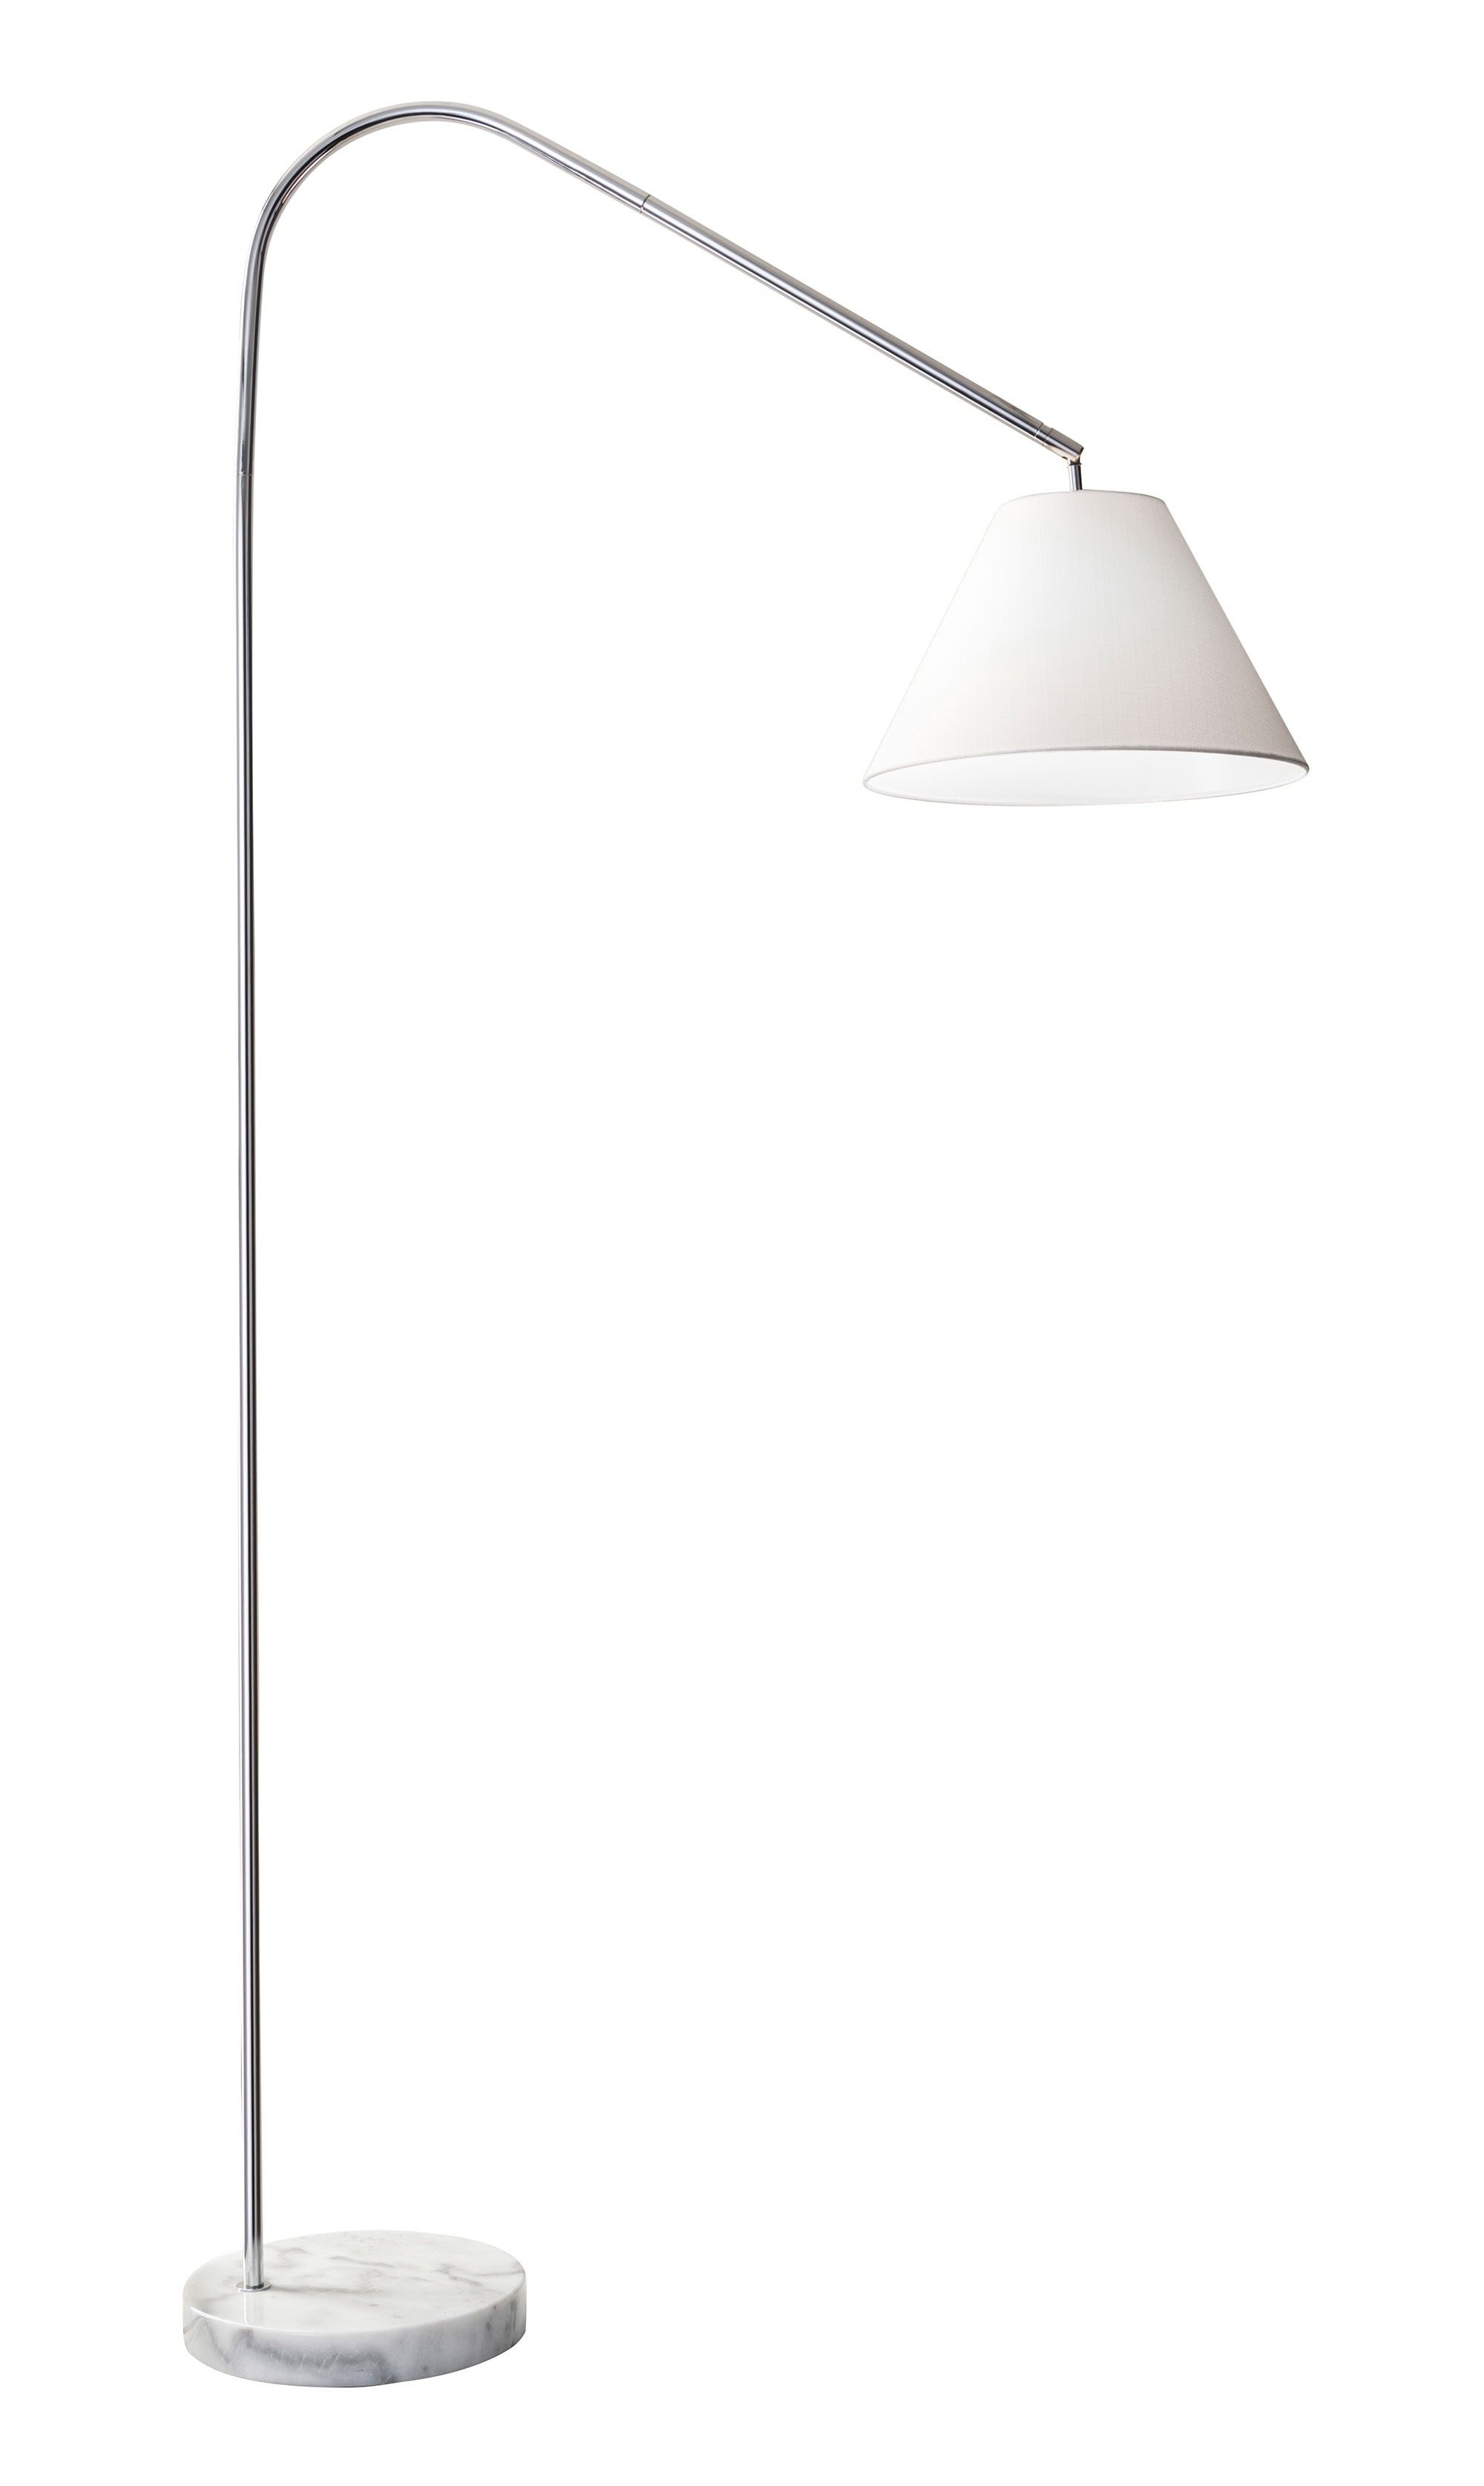 Rogers Smart Light Bulb